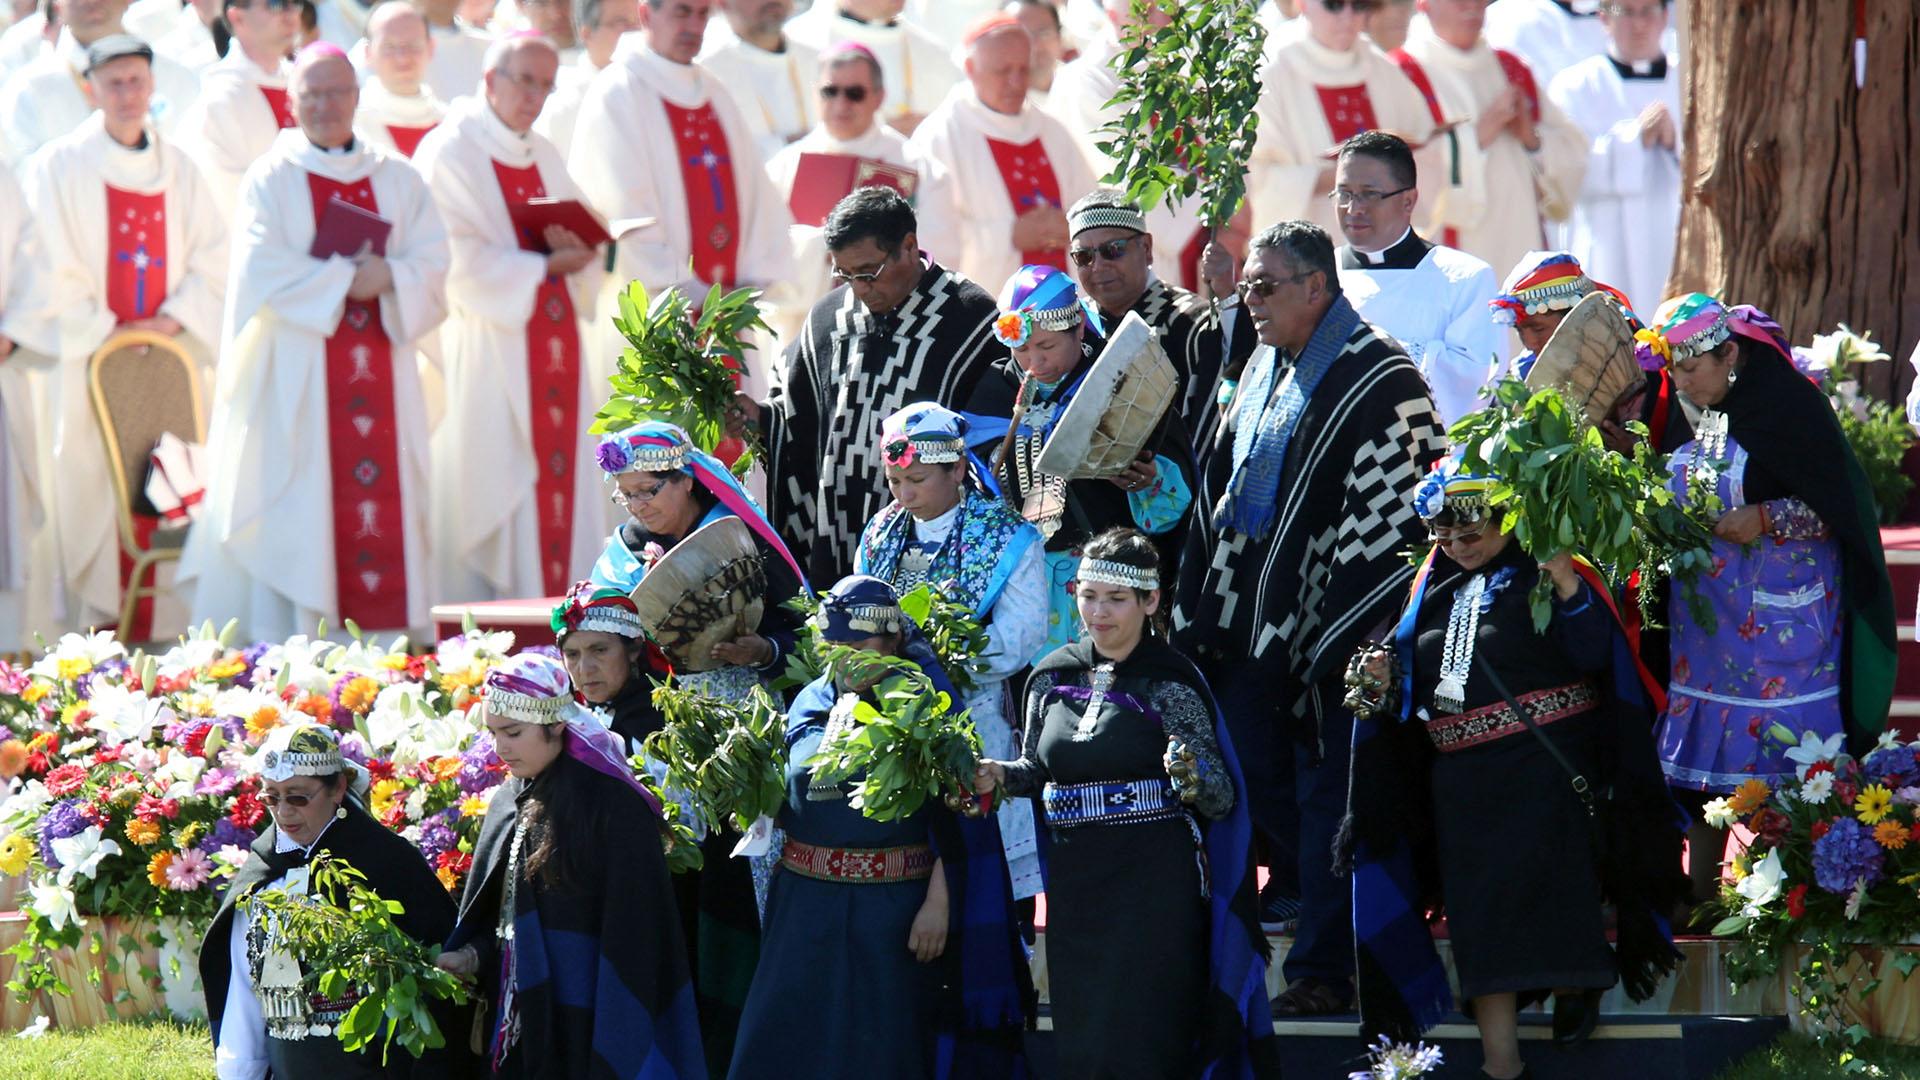 El líder de la Iglesia católica dio un mensaje de unidad (Reuters)